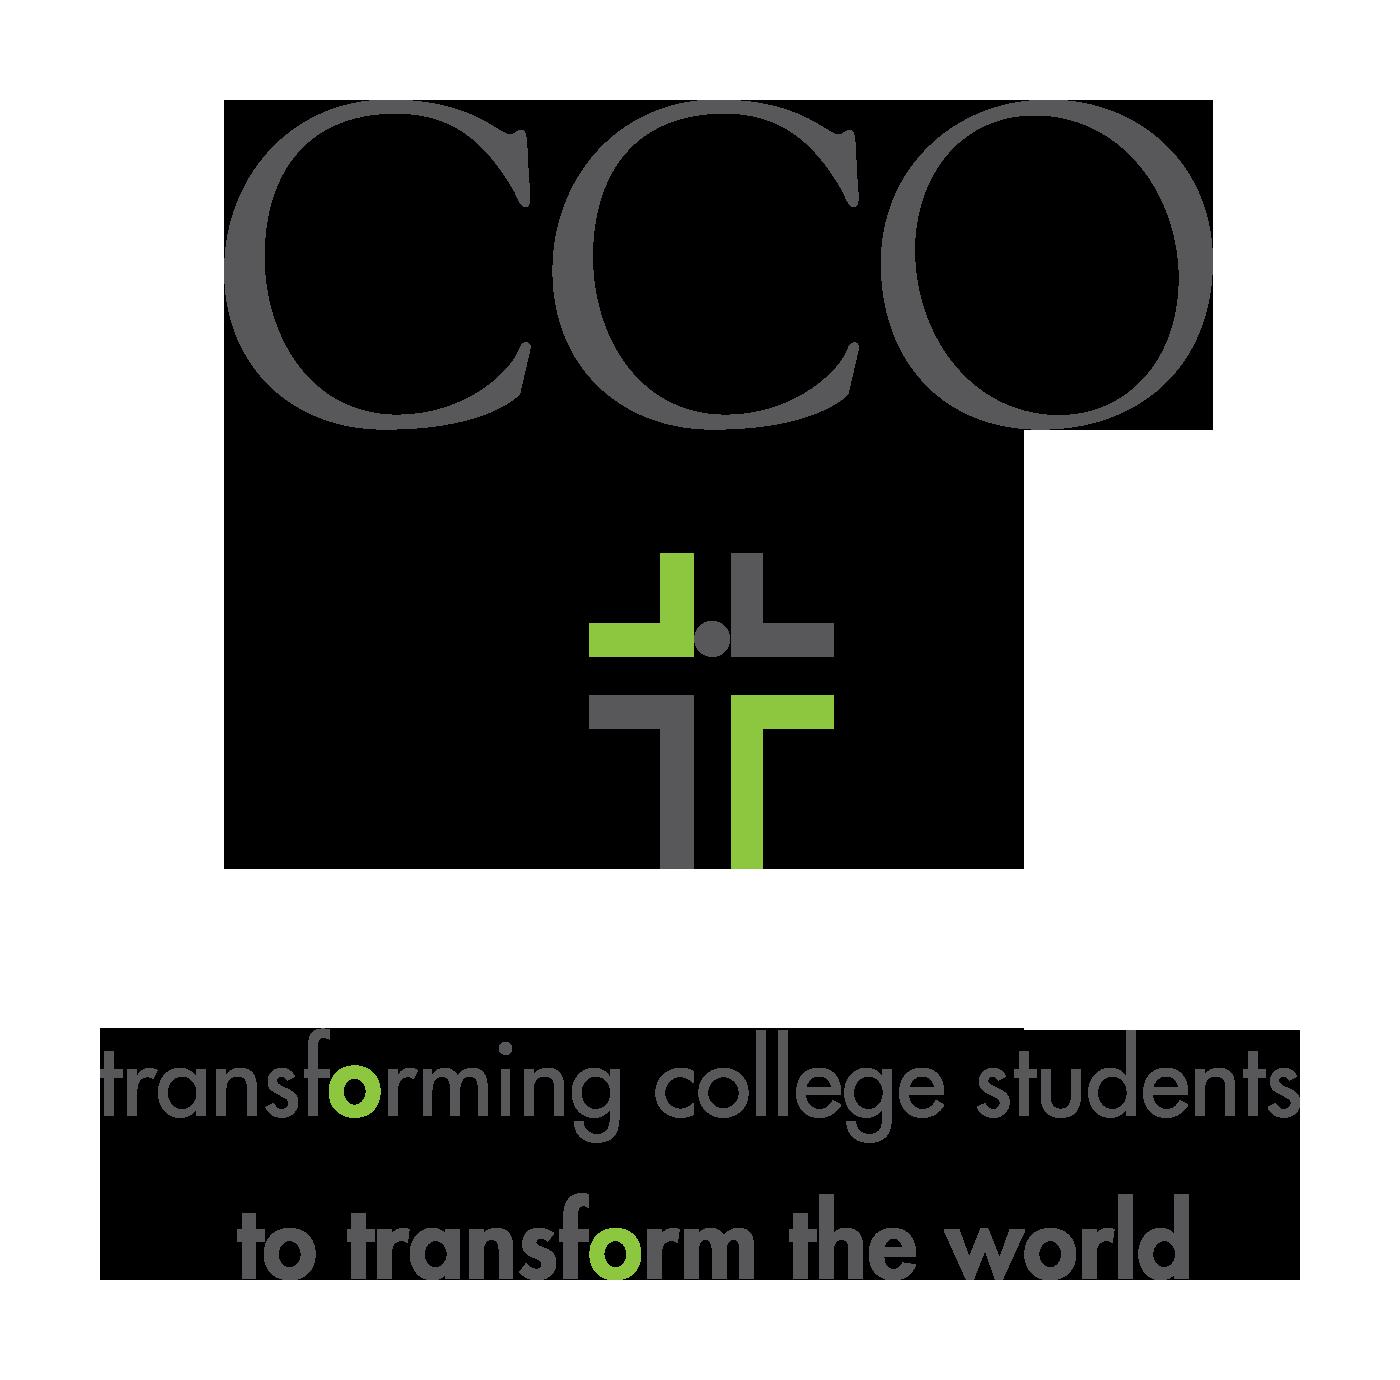 cco-logocolorpurpose.png